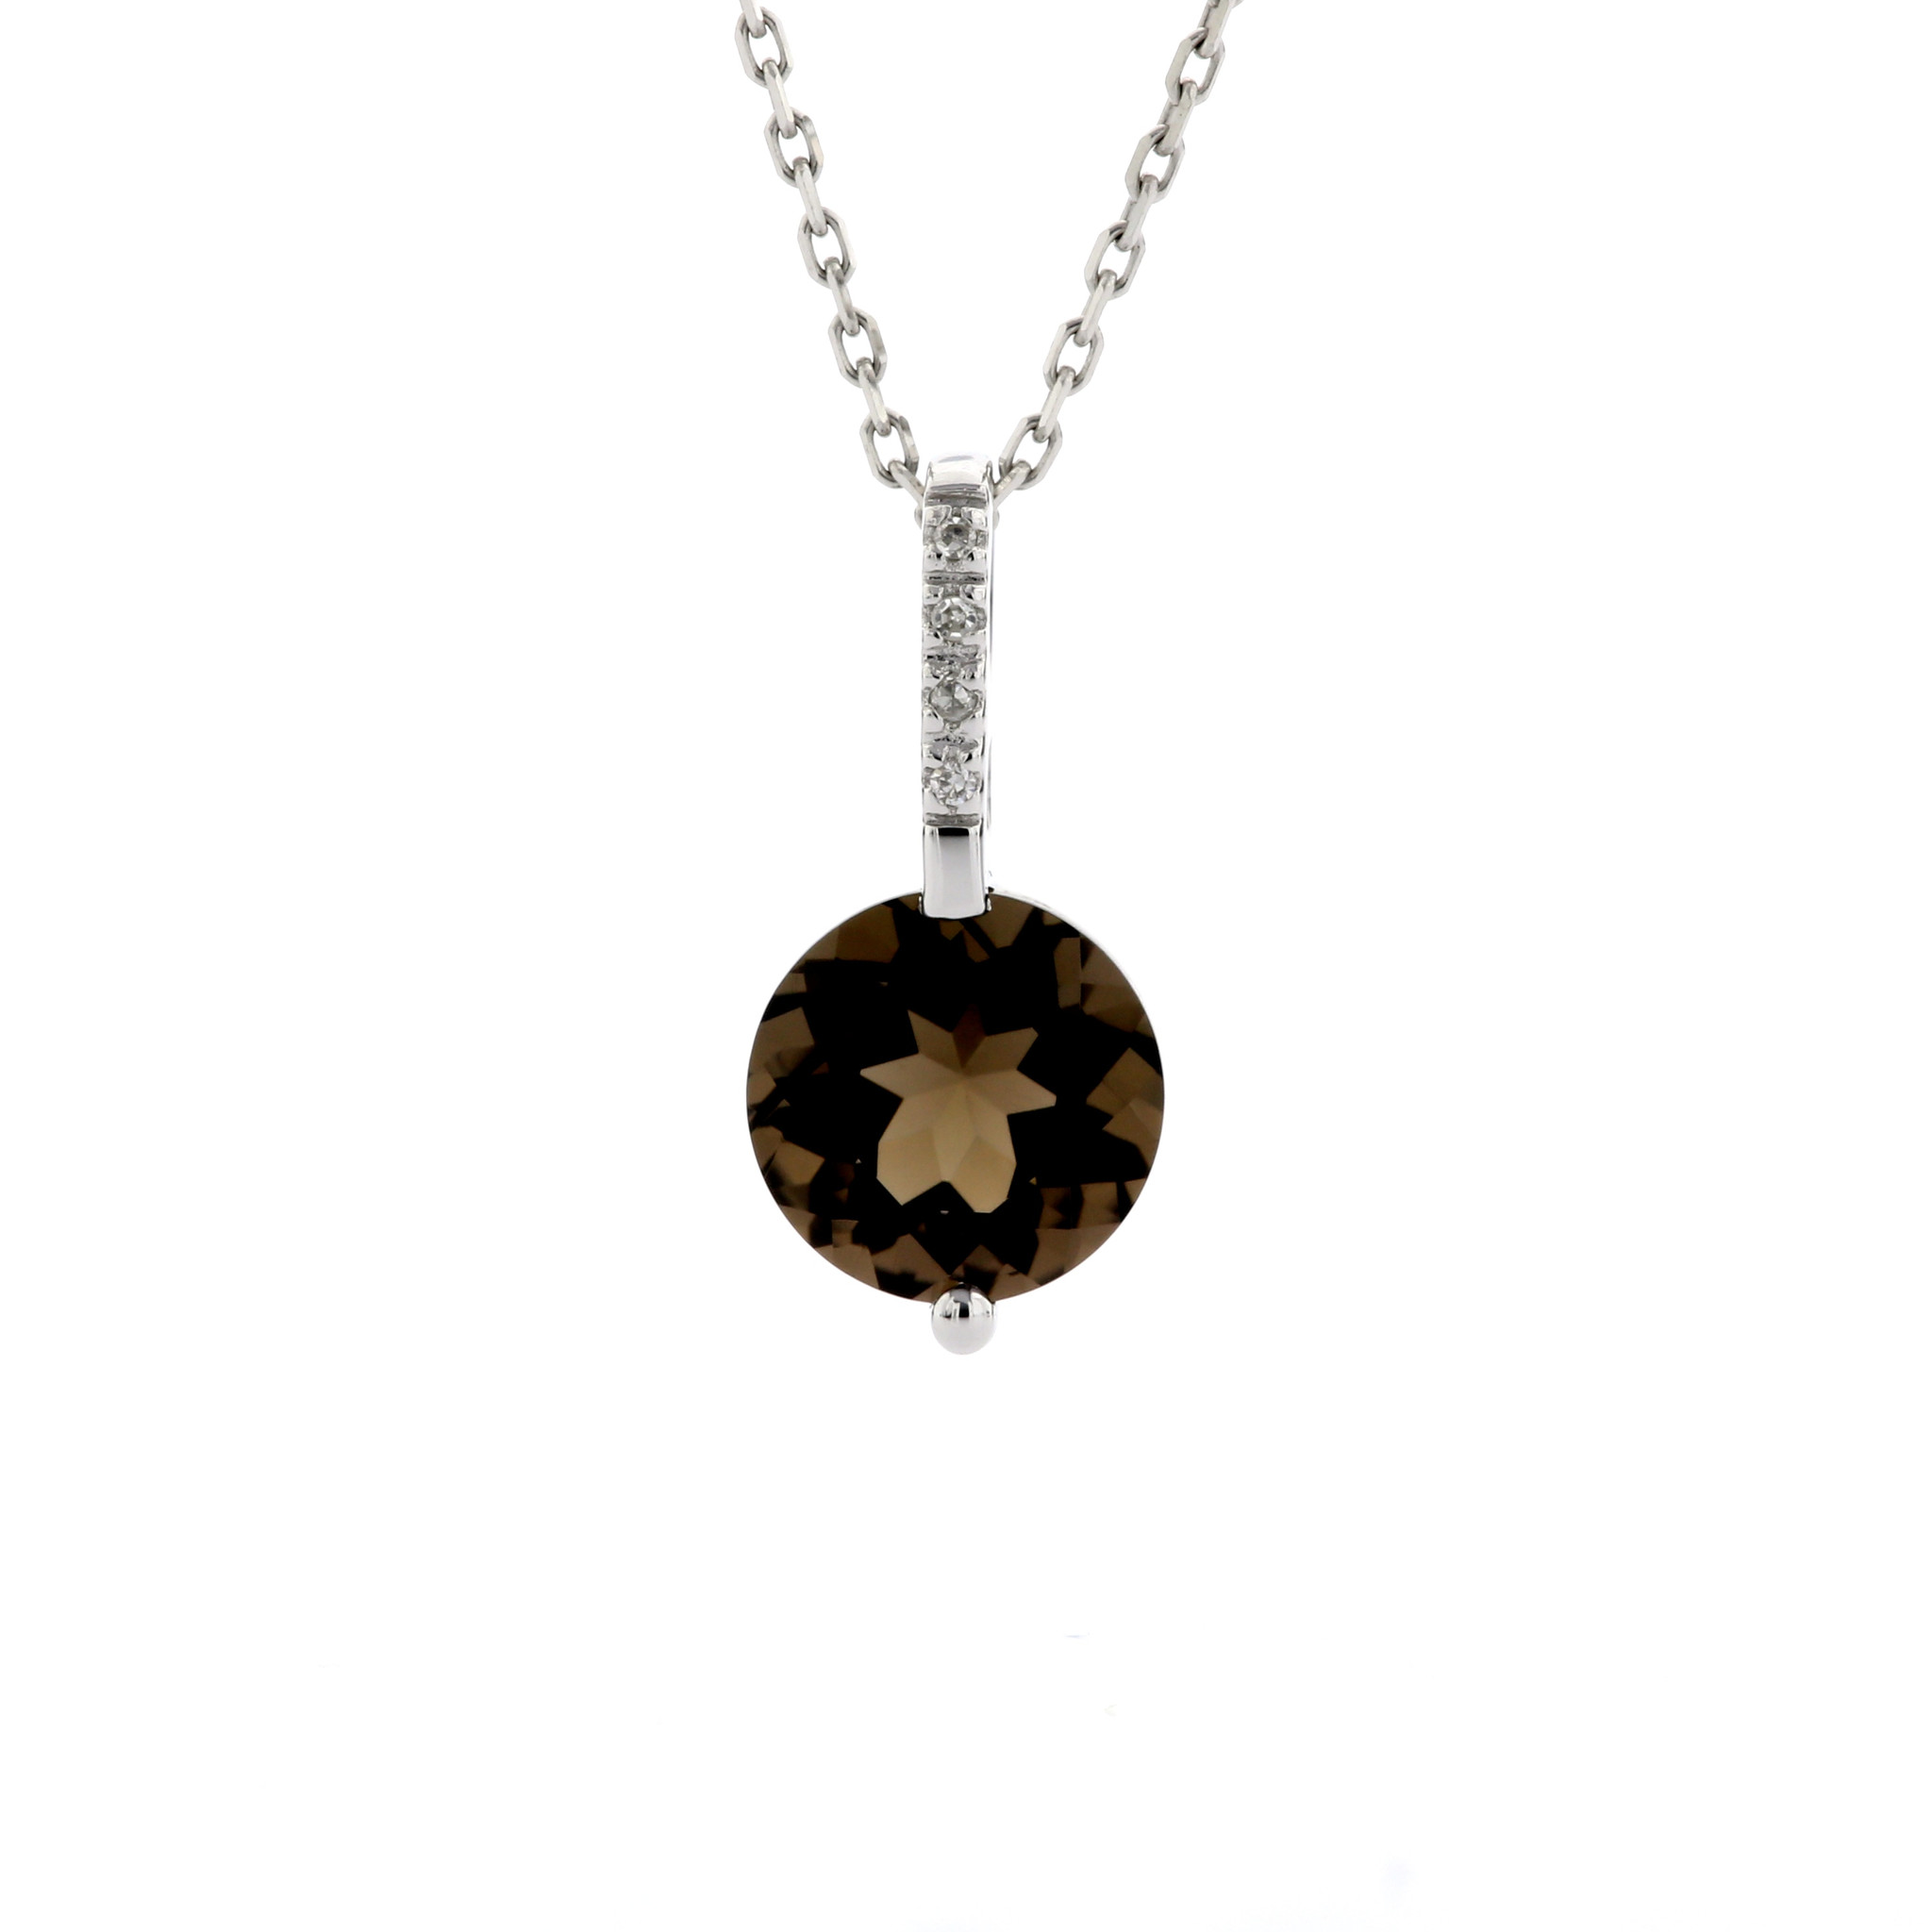 14k OVAL DROP PENDANT WITH DIAMOND BAIL Maddaloni Jewelers long island Jewelery